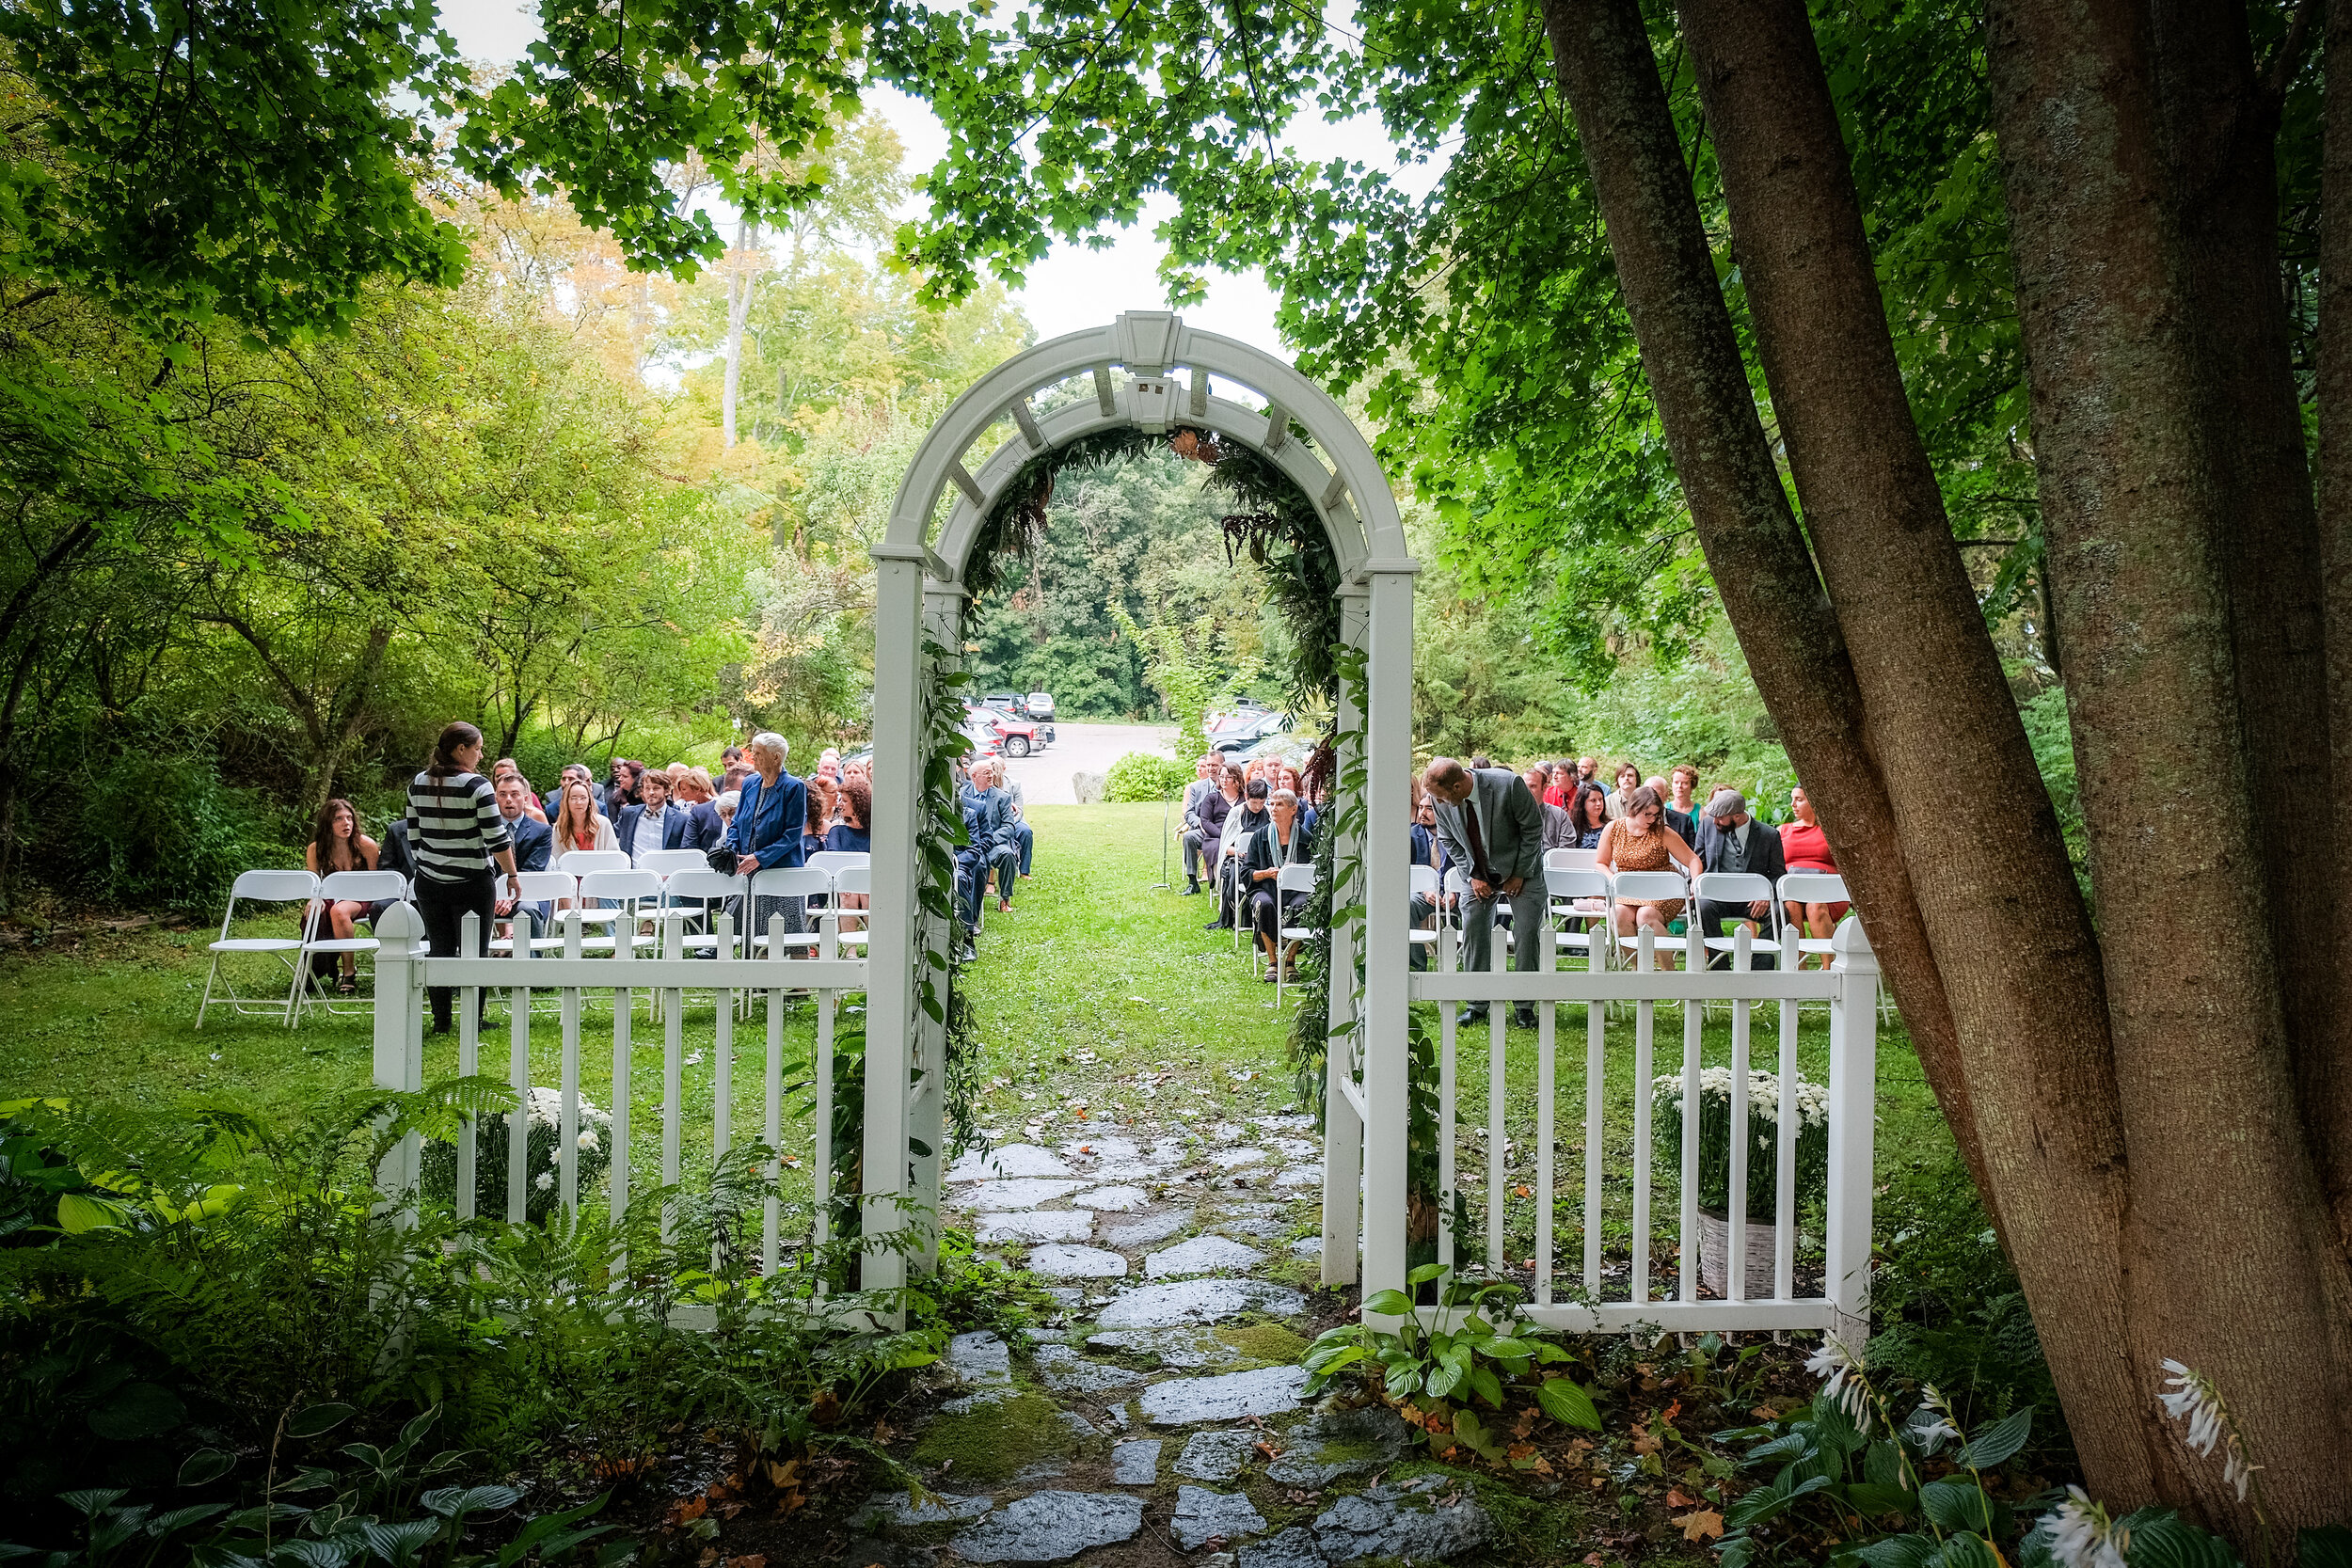 three-chimneys-inn-wedding-photography-452.jpg